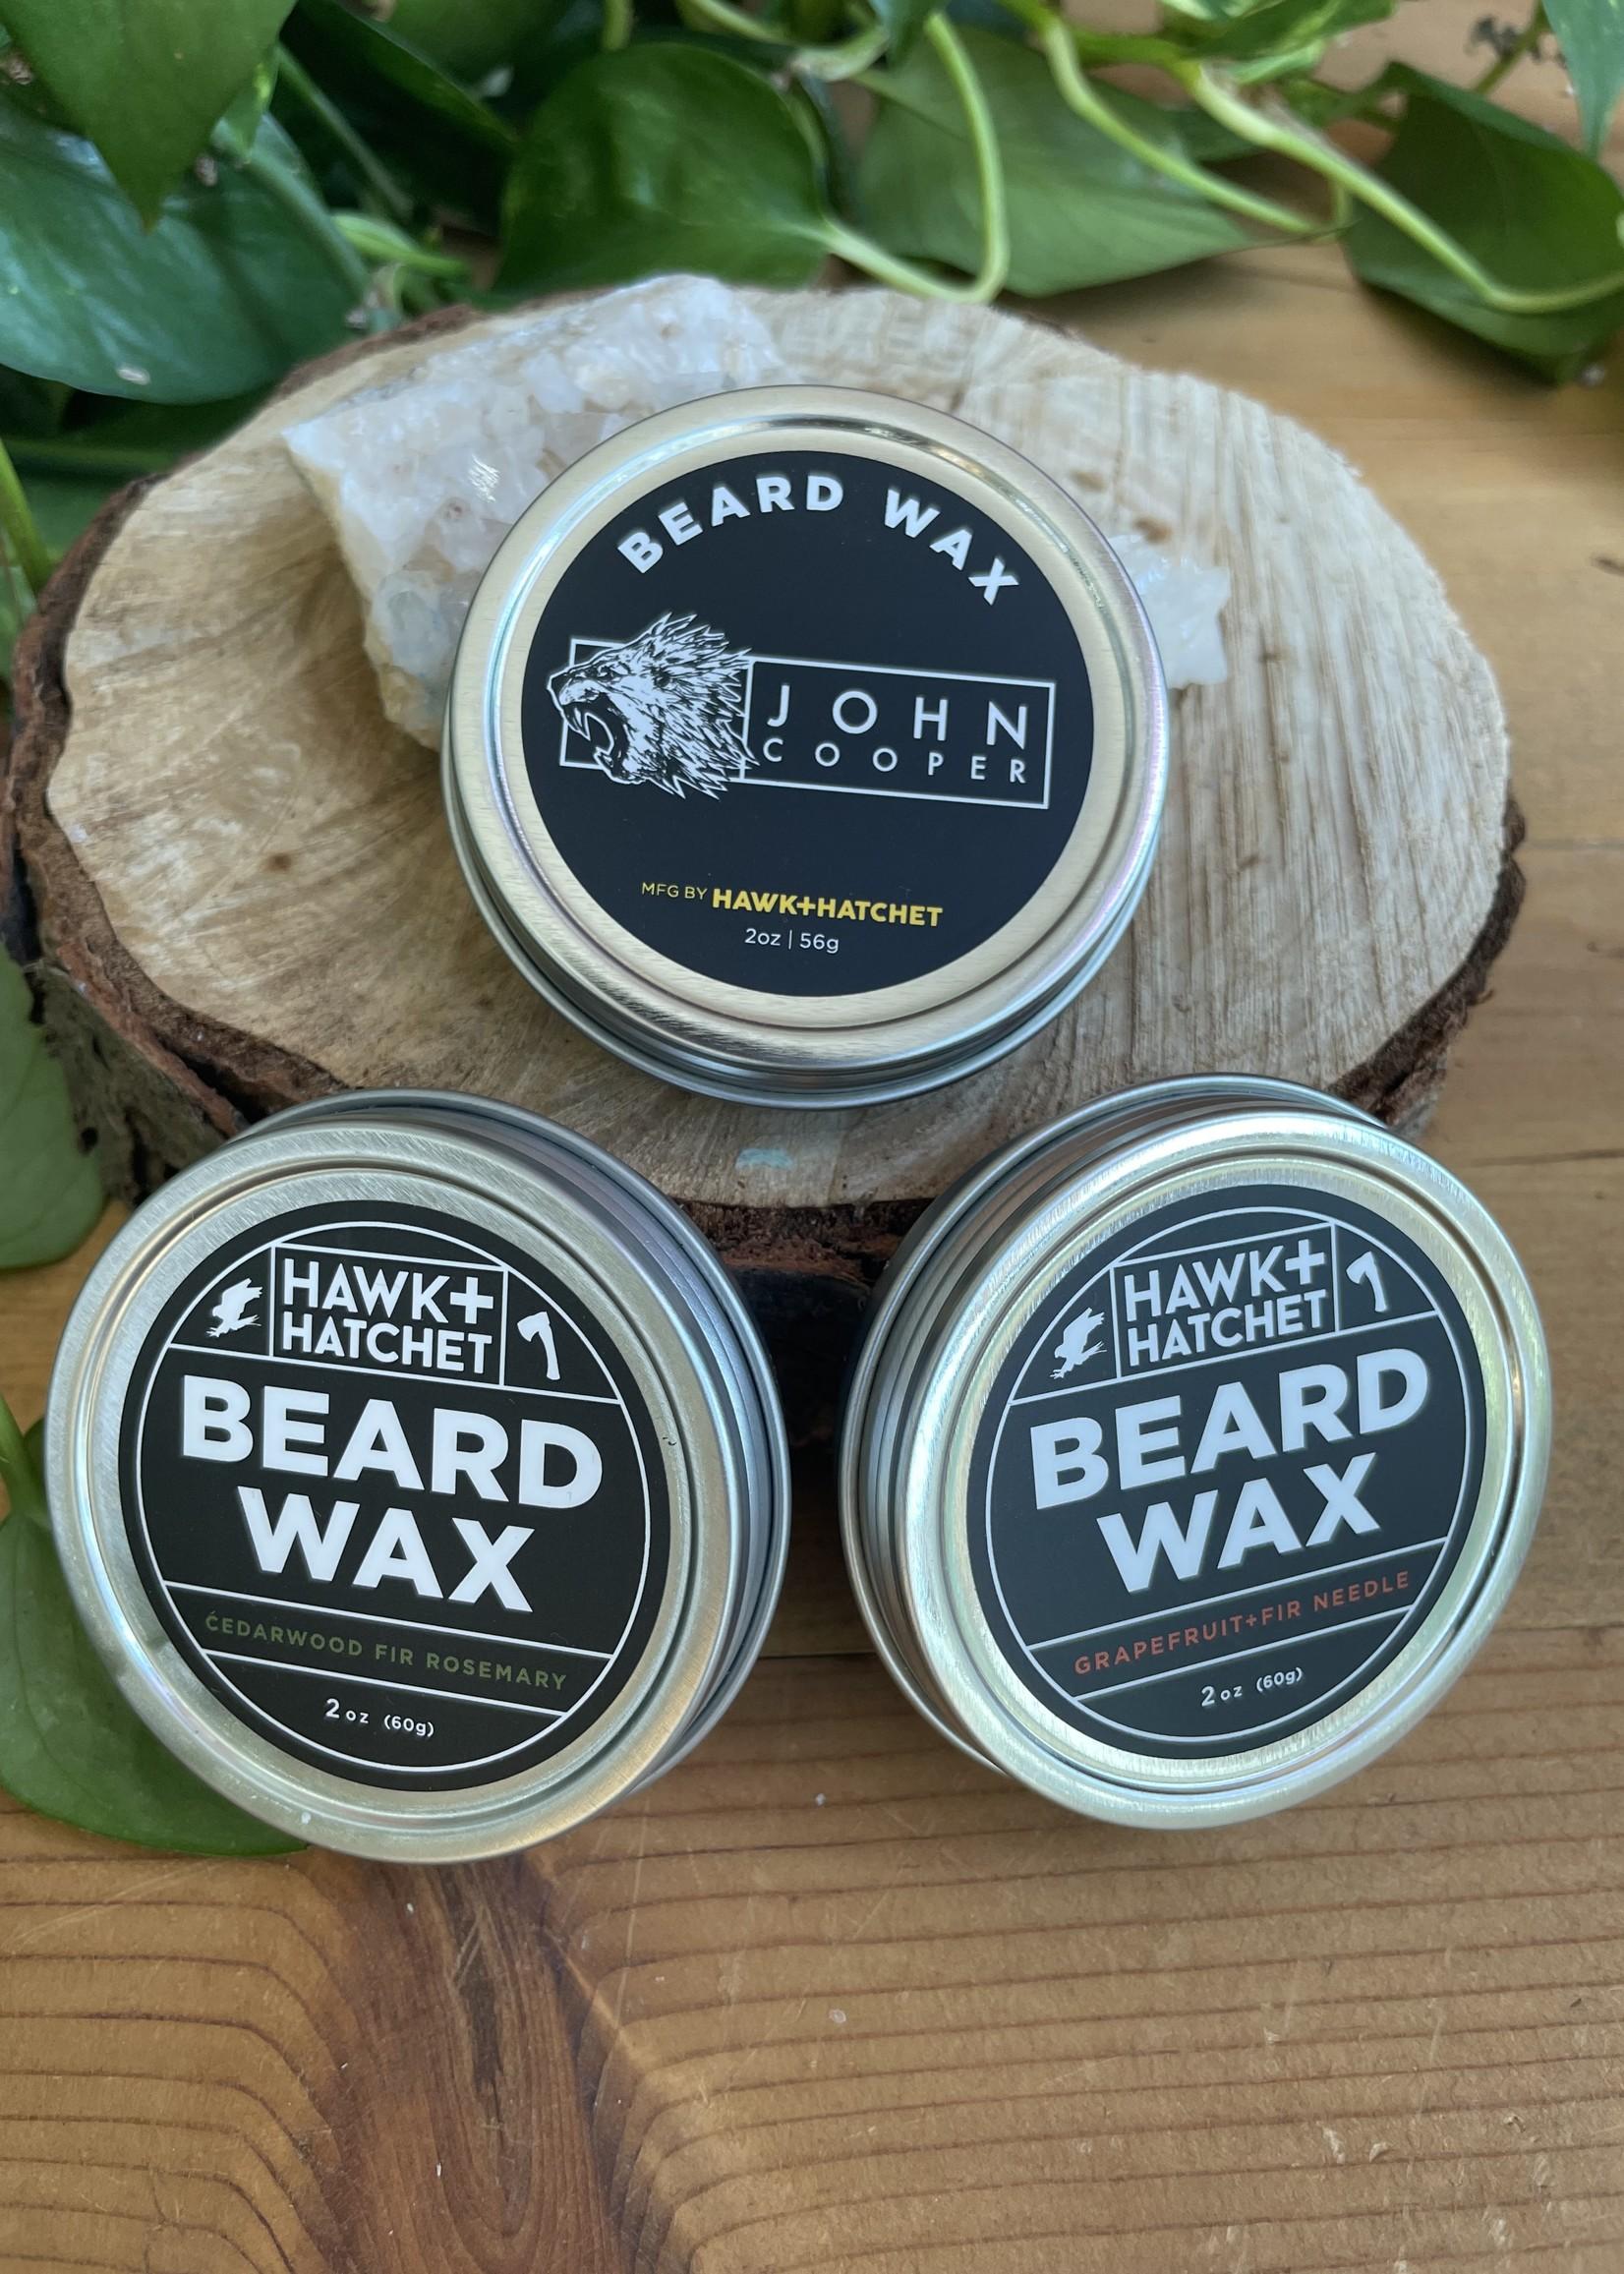 Hawk + Hatchet Hawk + Hatchet: Beard Wax